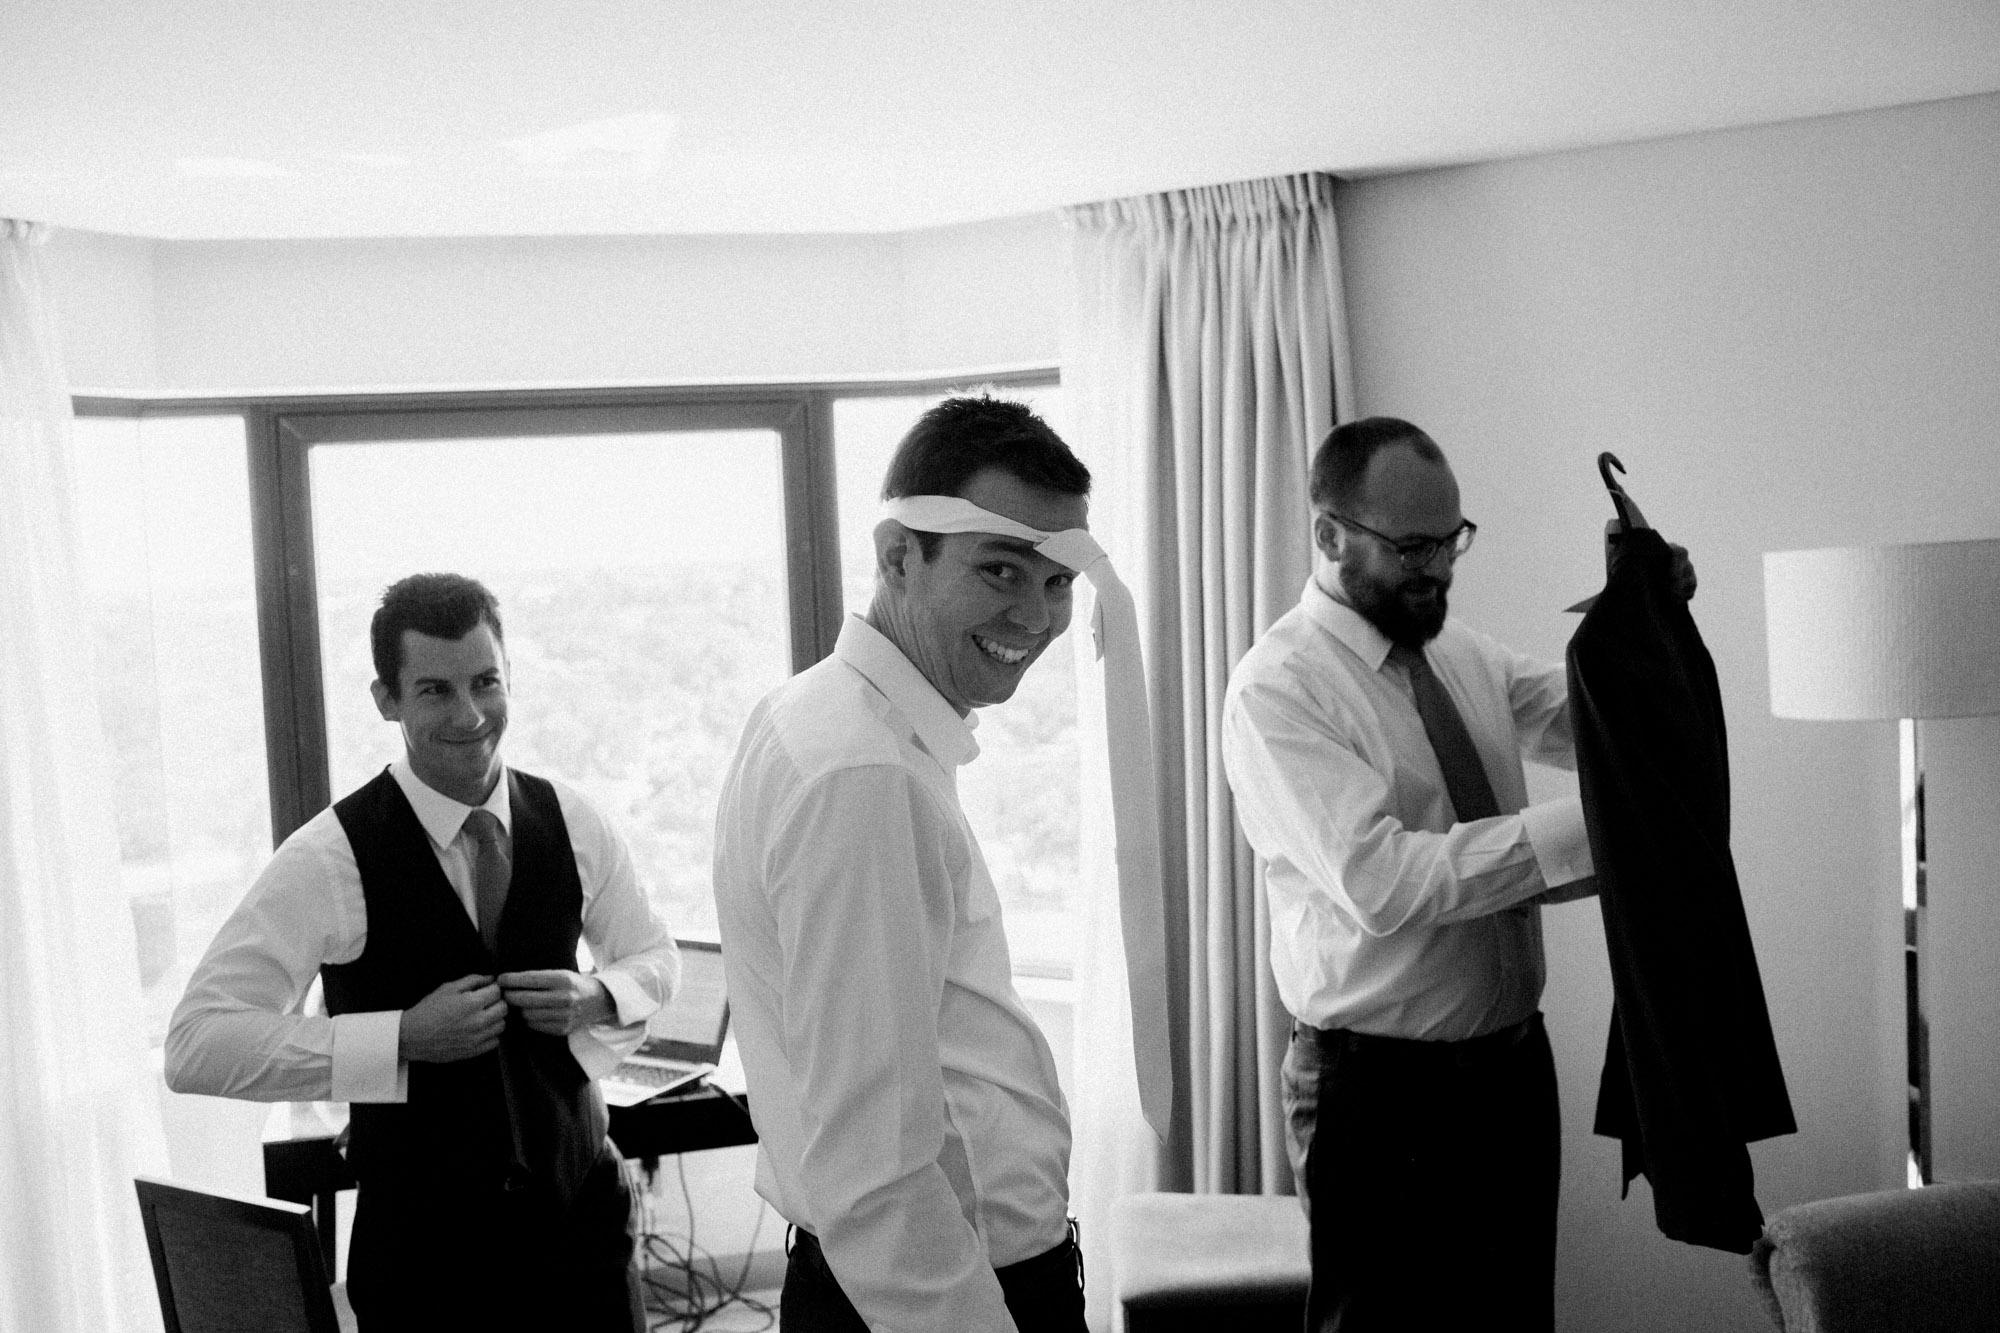 Glen-Ewin-Estate-wedding-photography-004.jpg